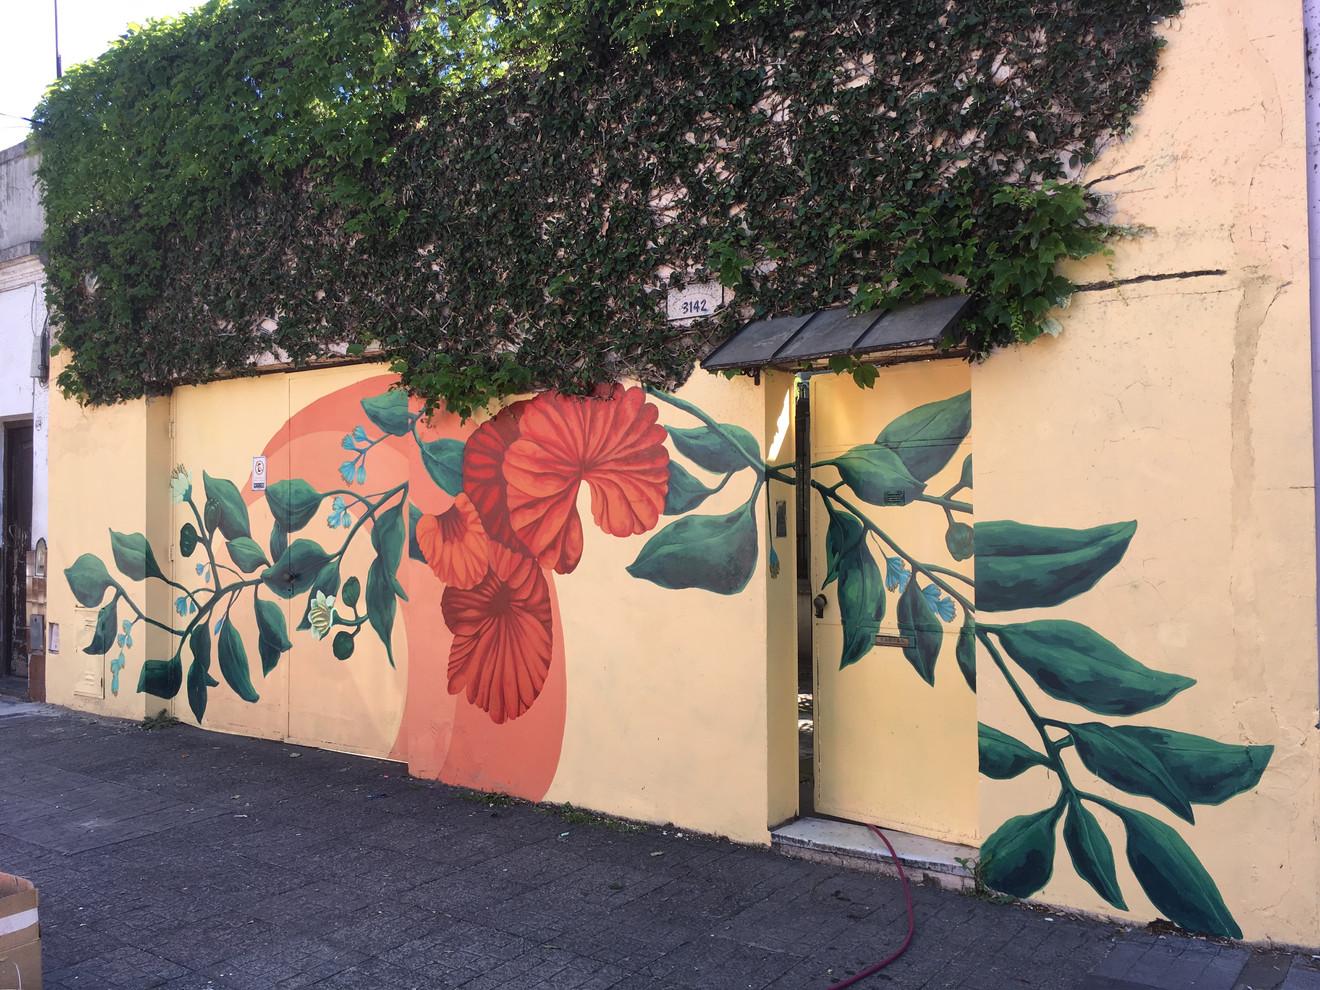 La Enamorada del Muro